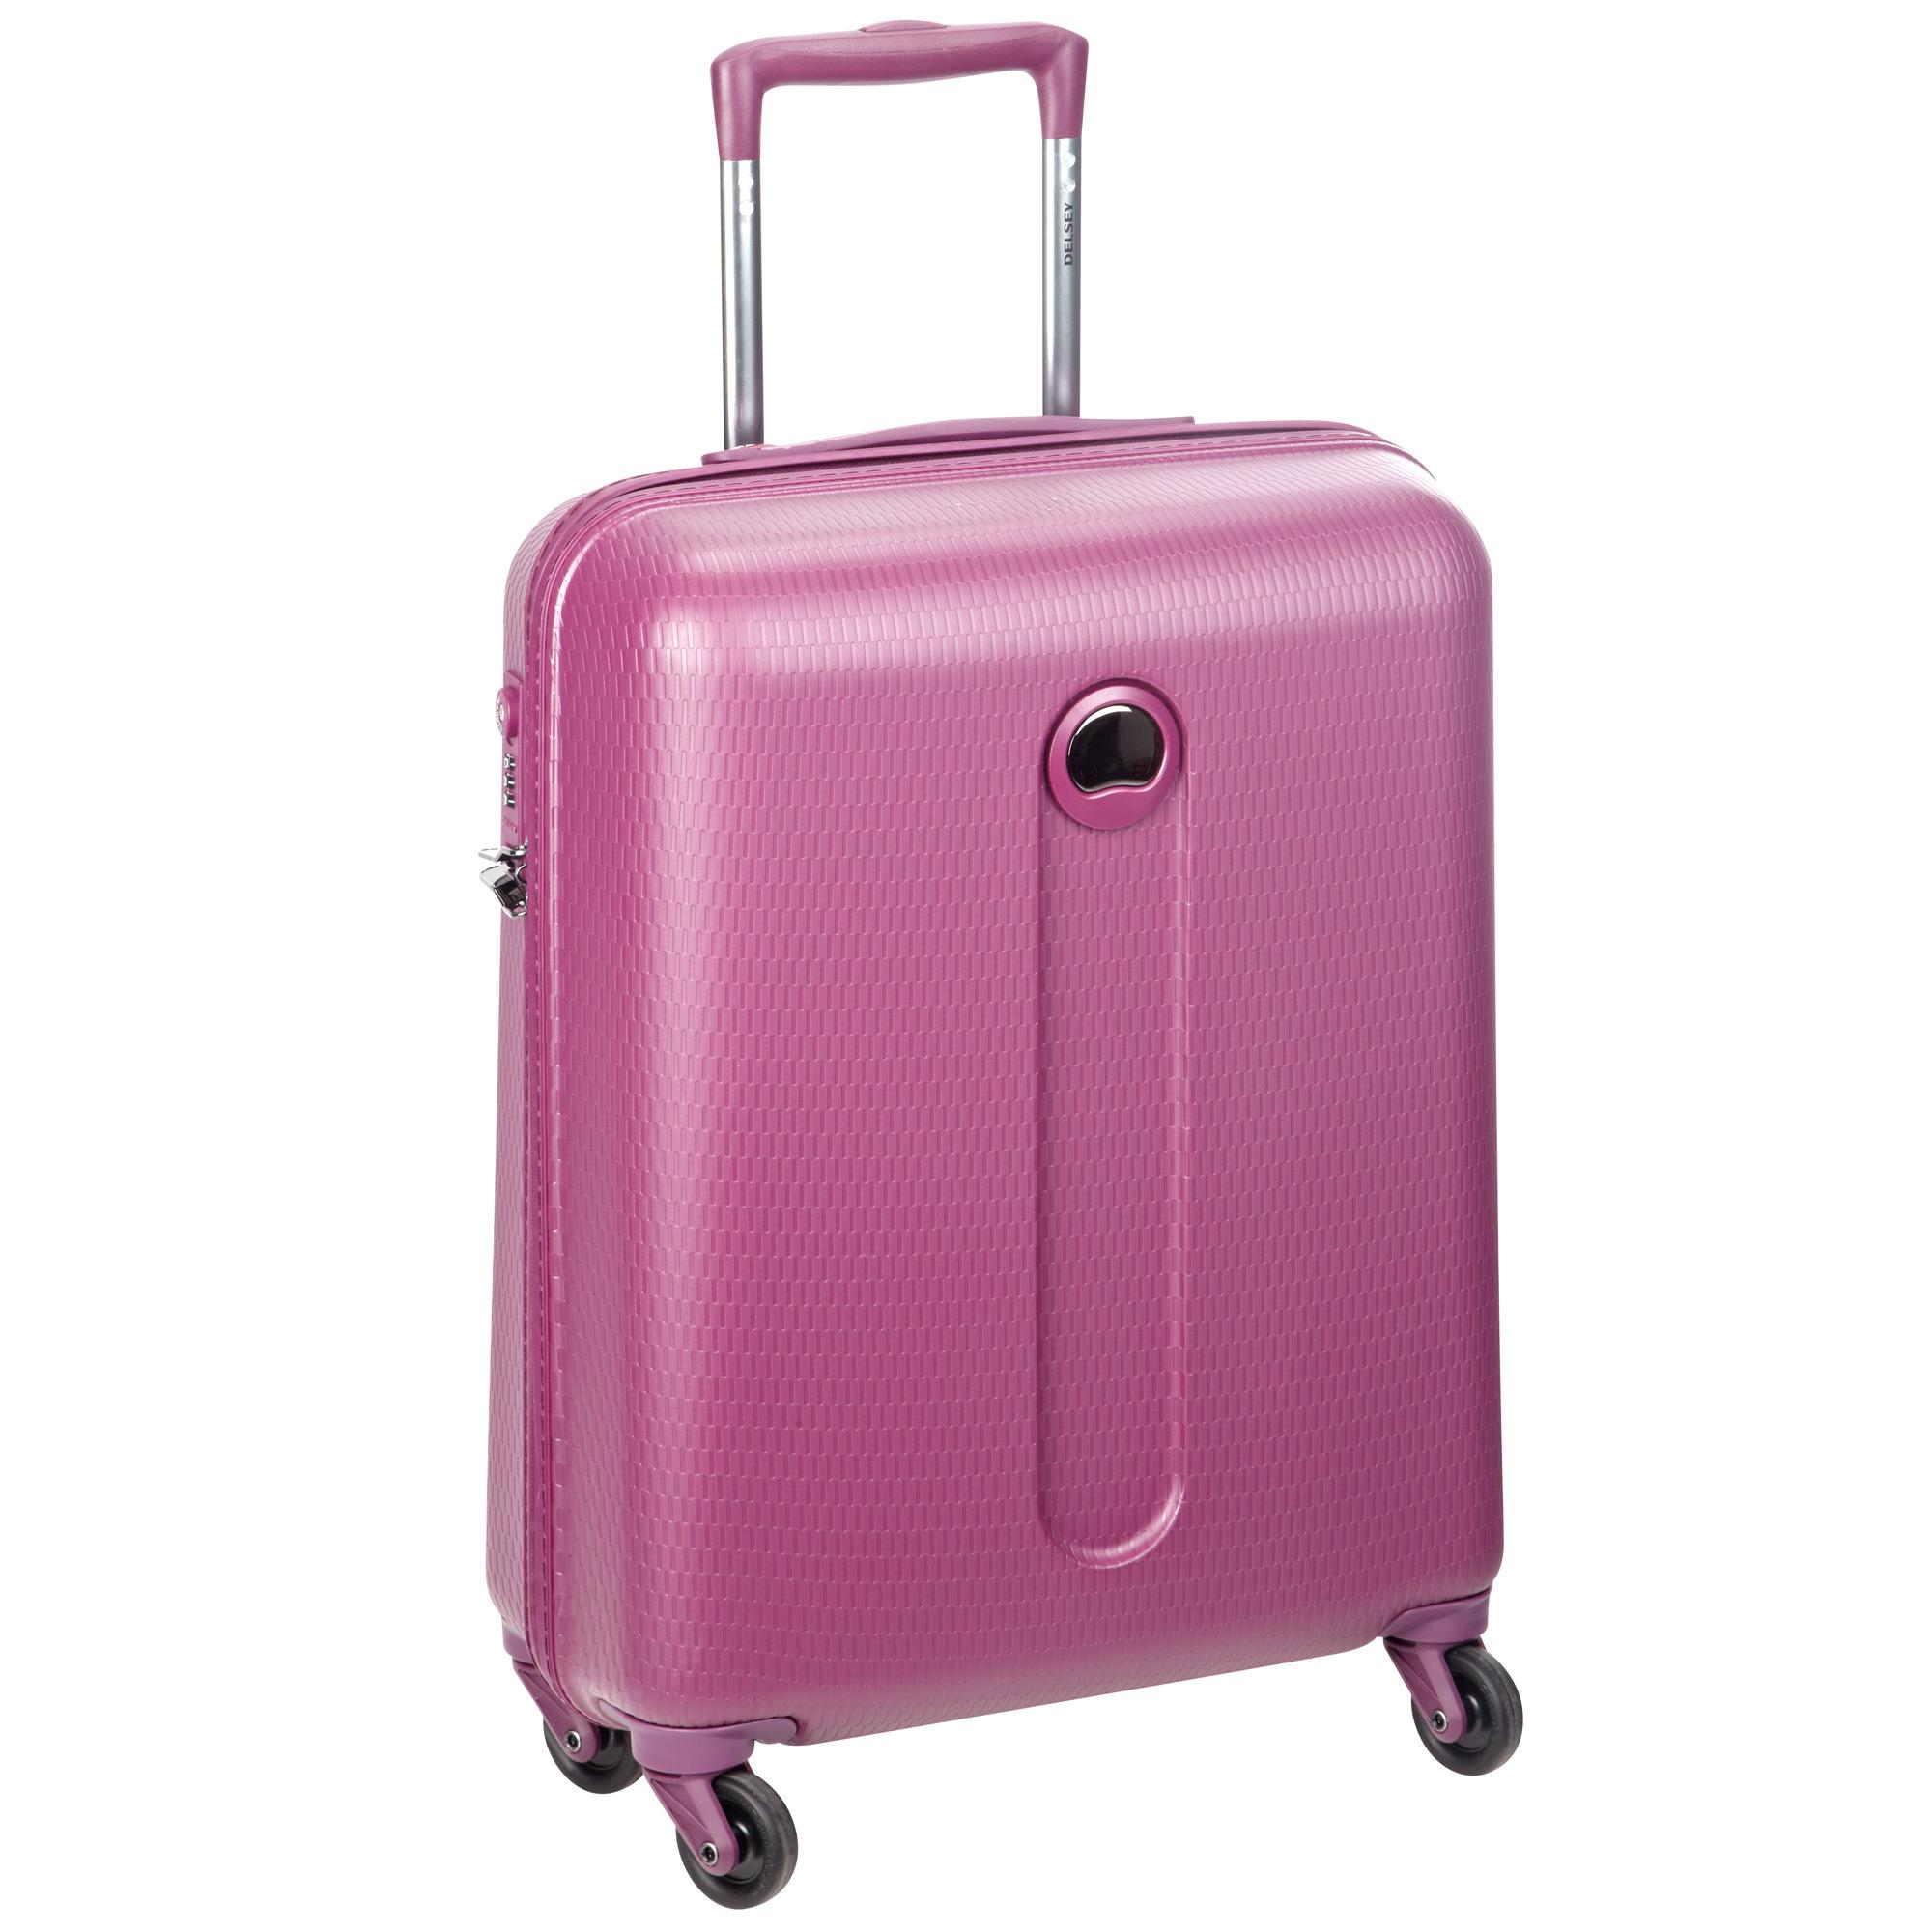 Чемодан Delsey Helium Slim Cabin Trolley 54 см фиолетовый